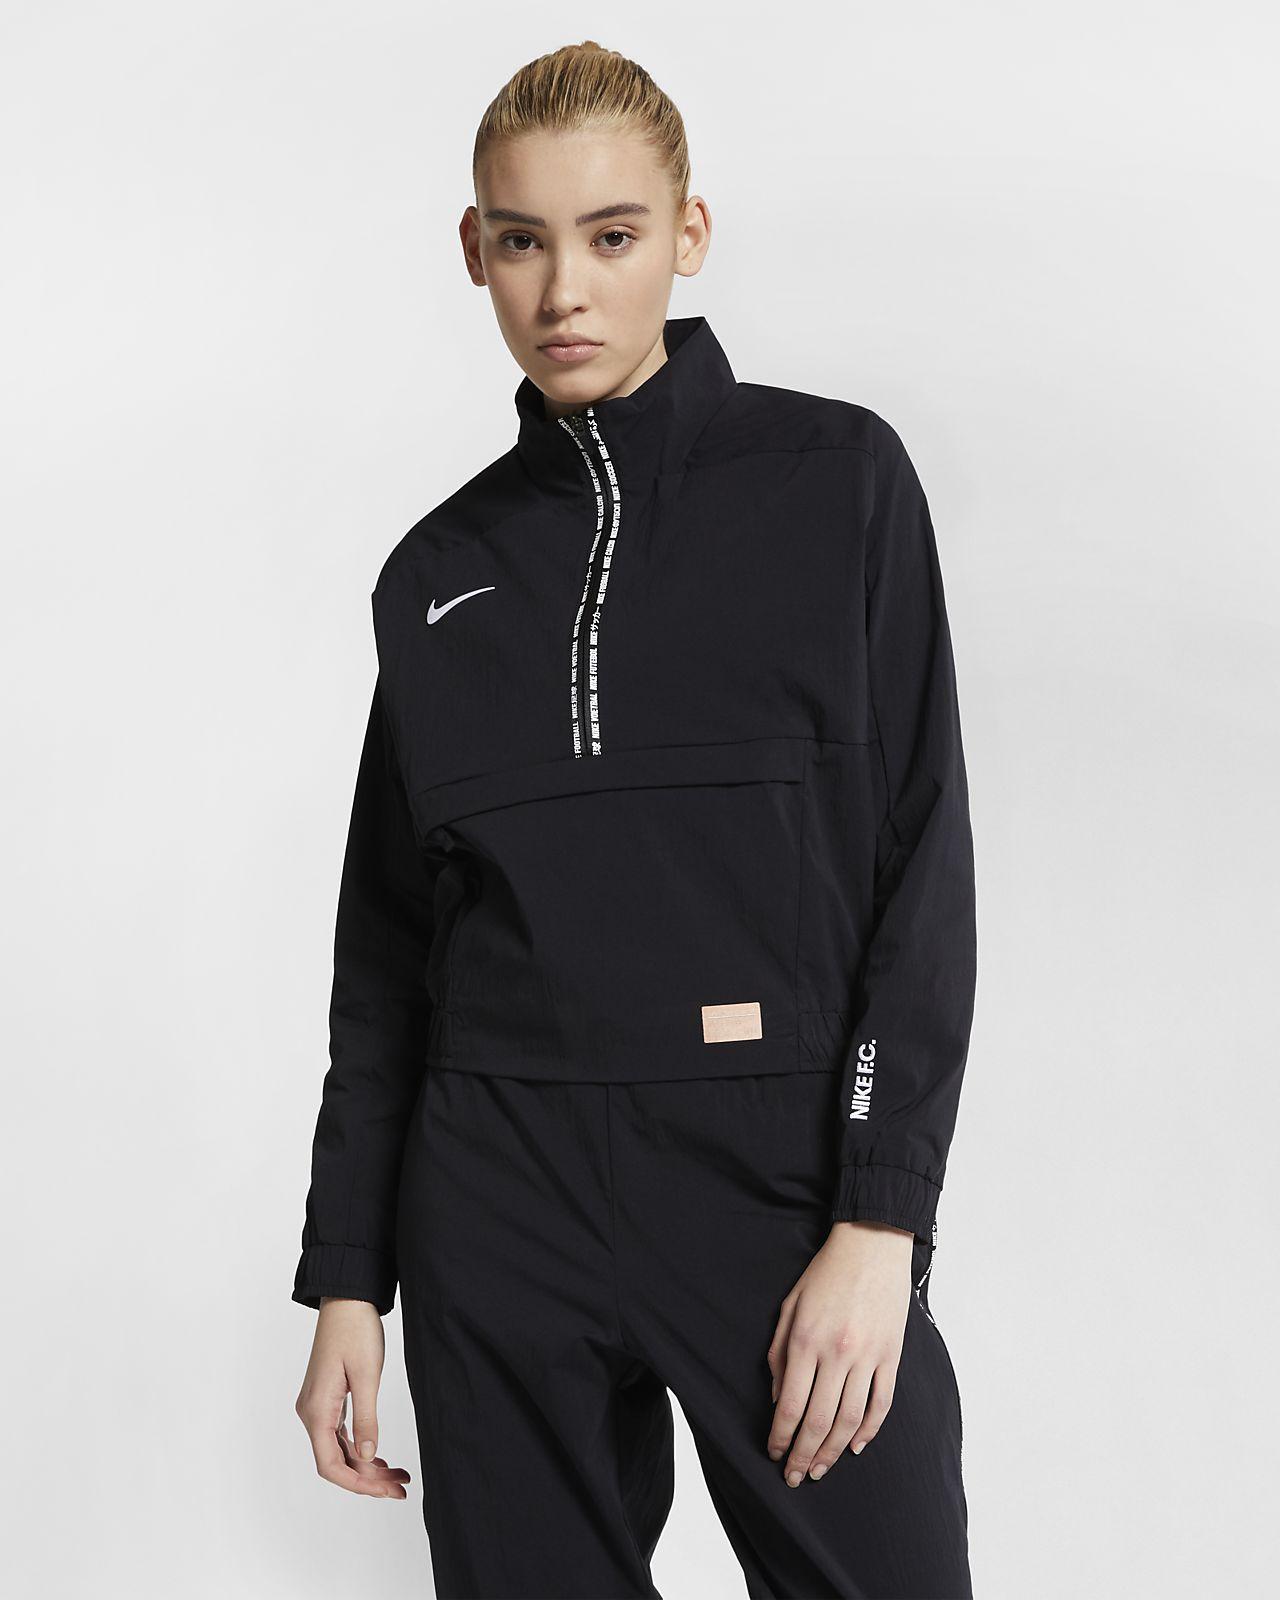 Damska koszulka piłkarska z długim rękawem Nike F.C.